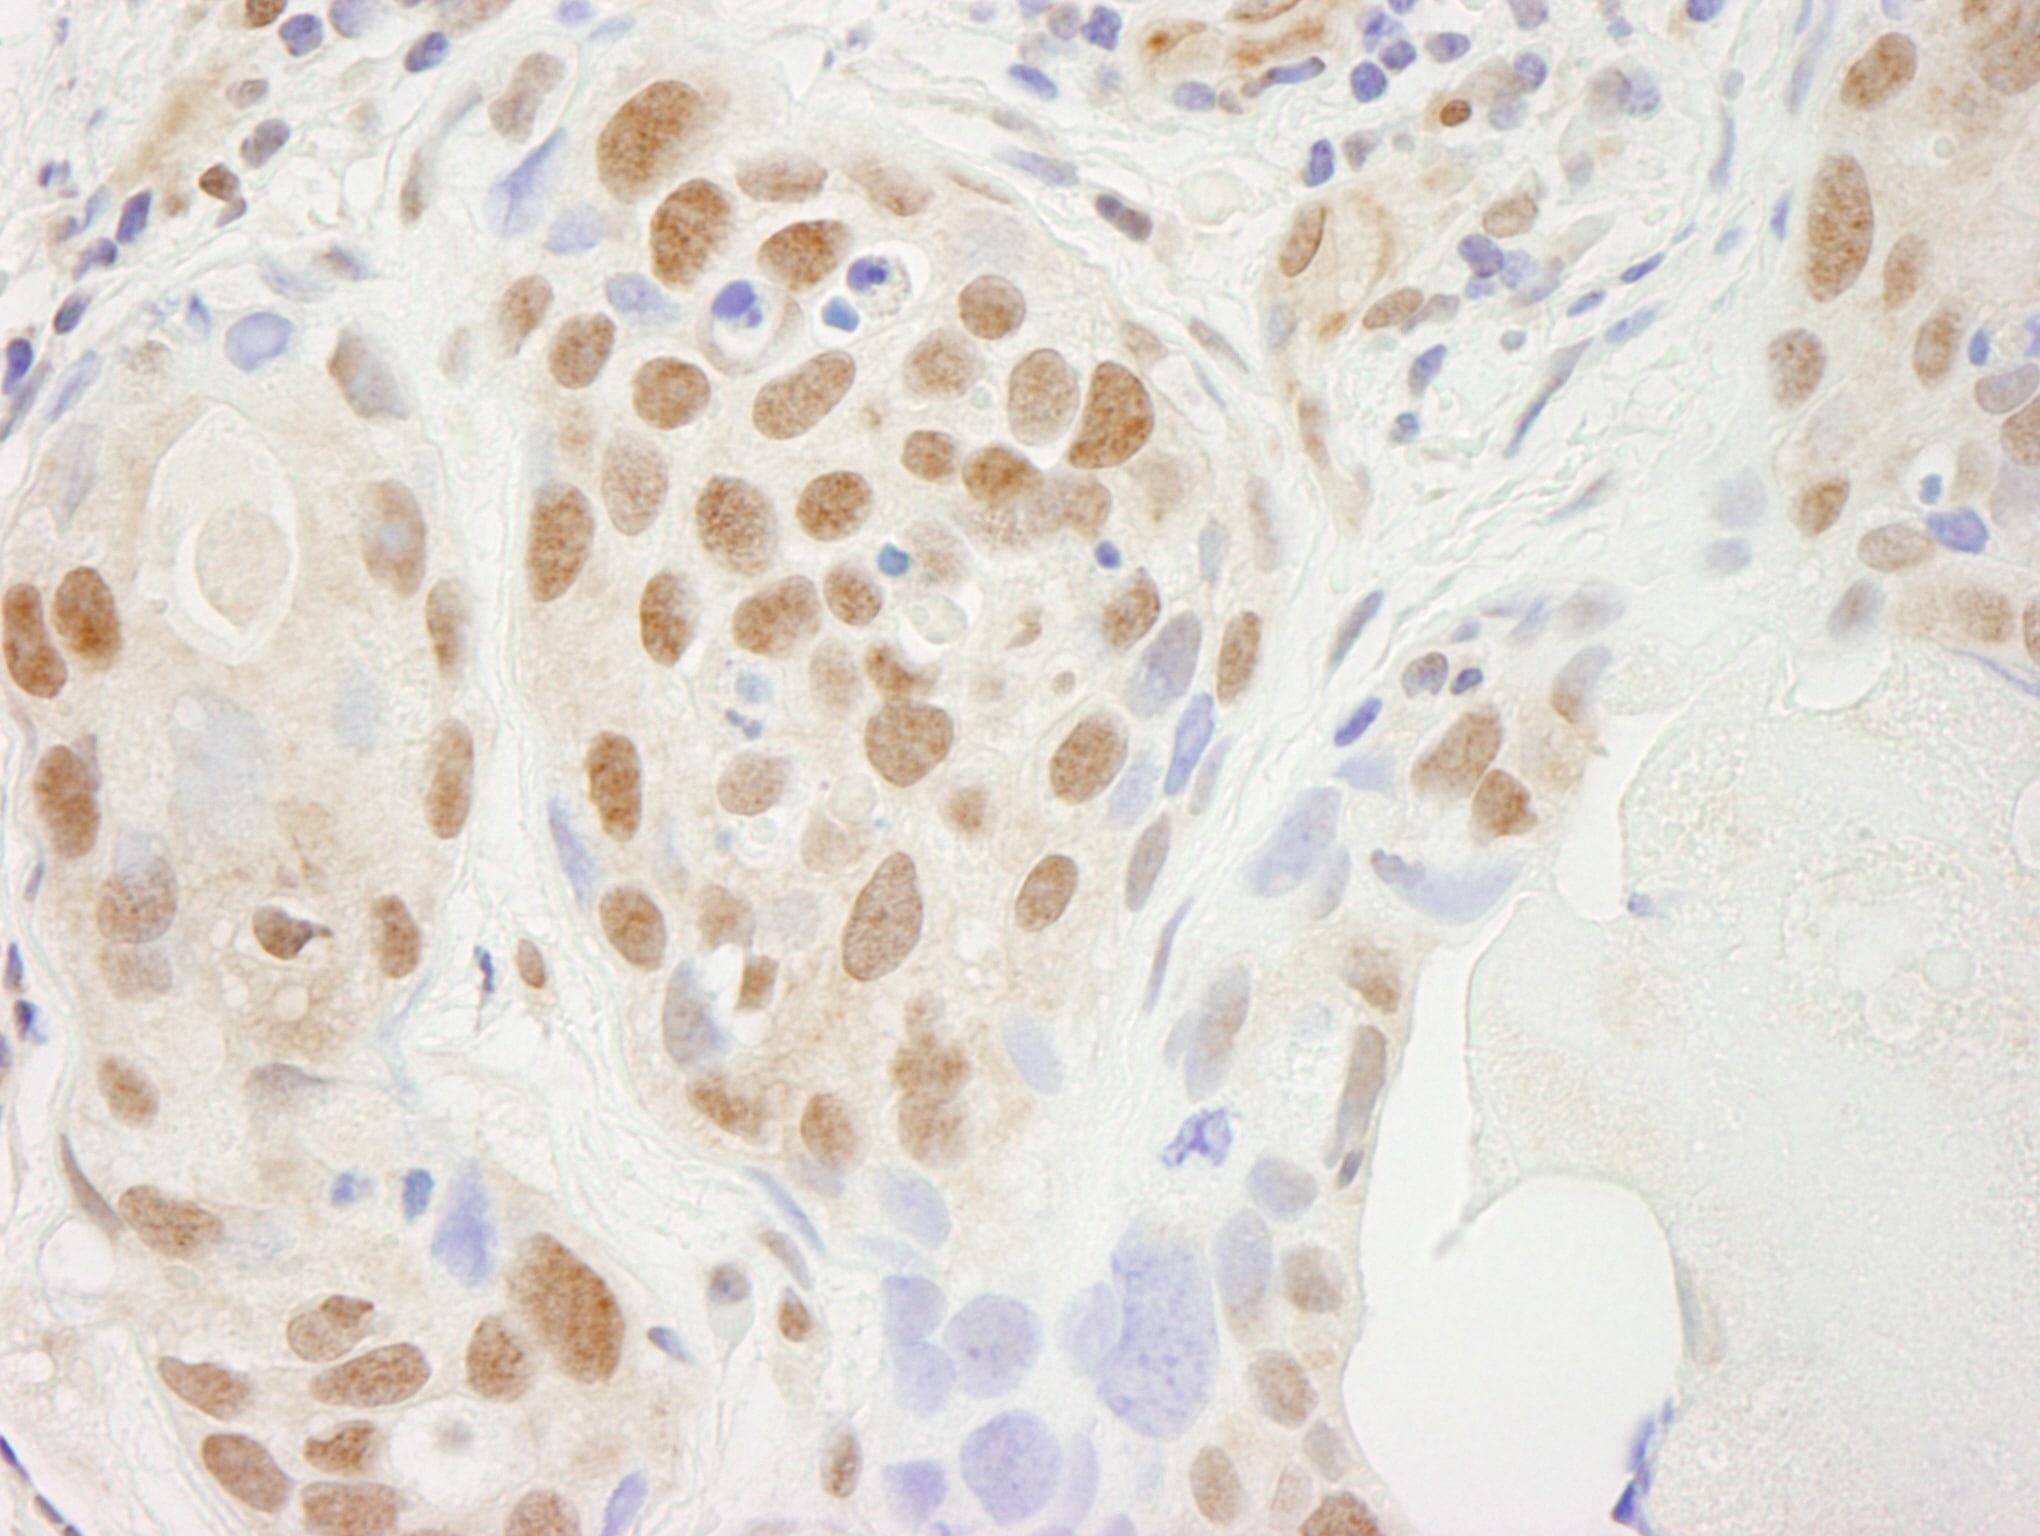 SUPT5H Antibody in Immunohistochemistry (IHC)